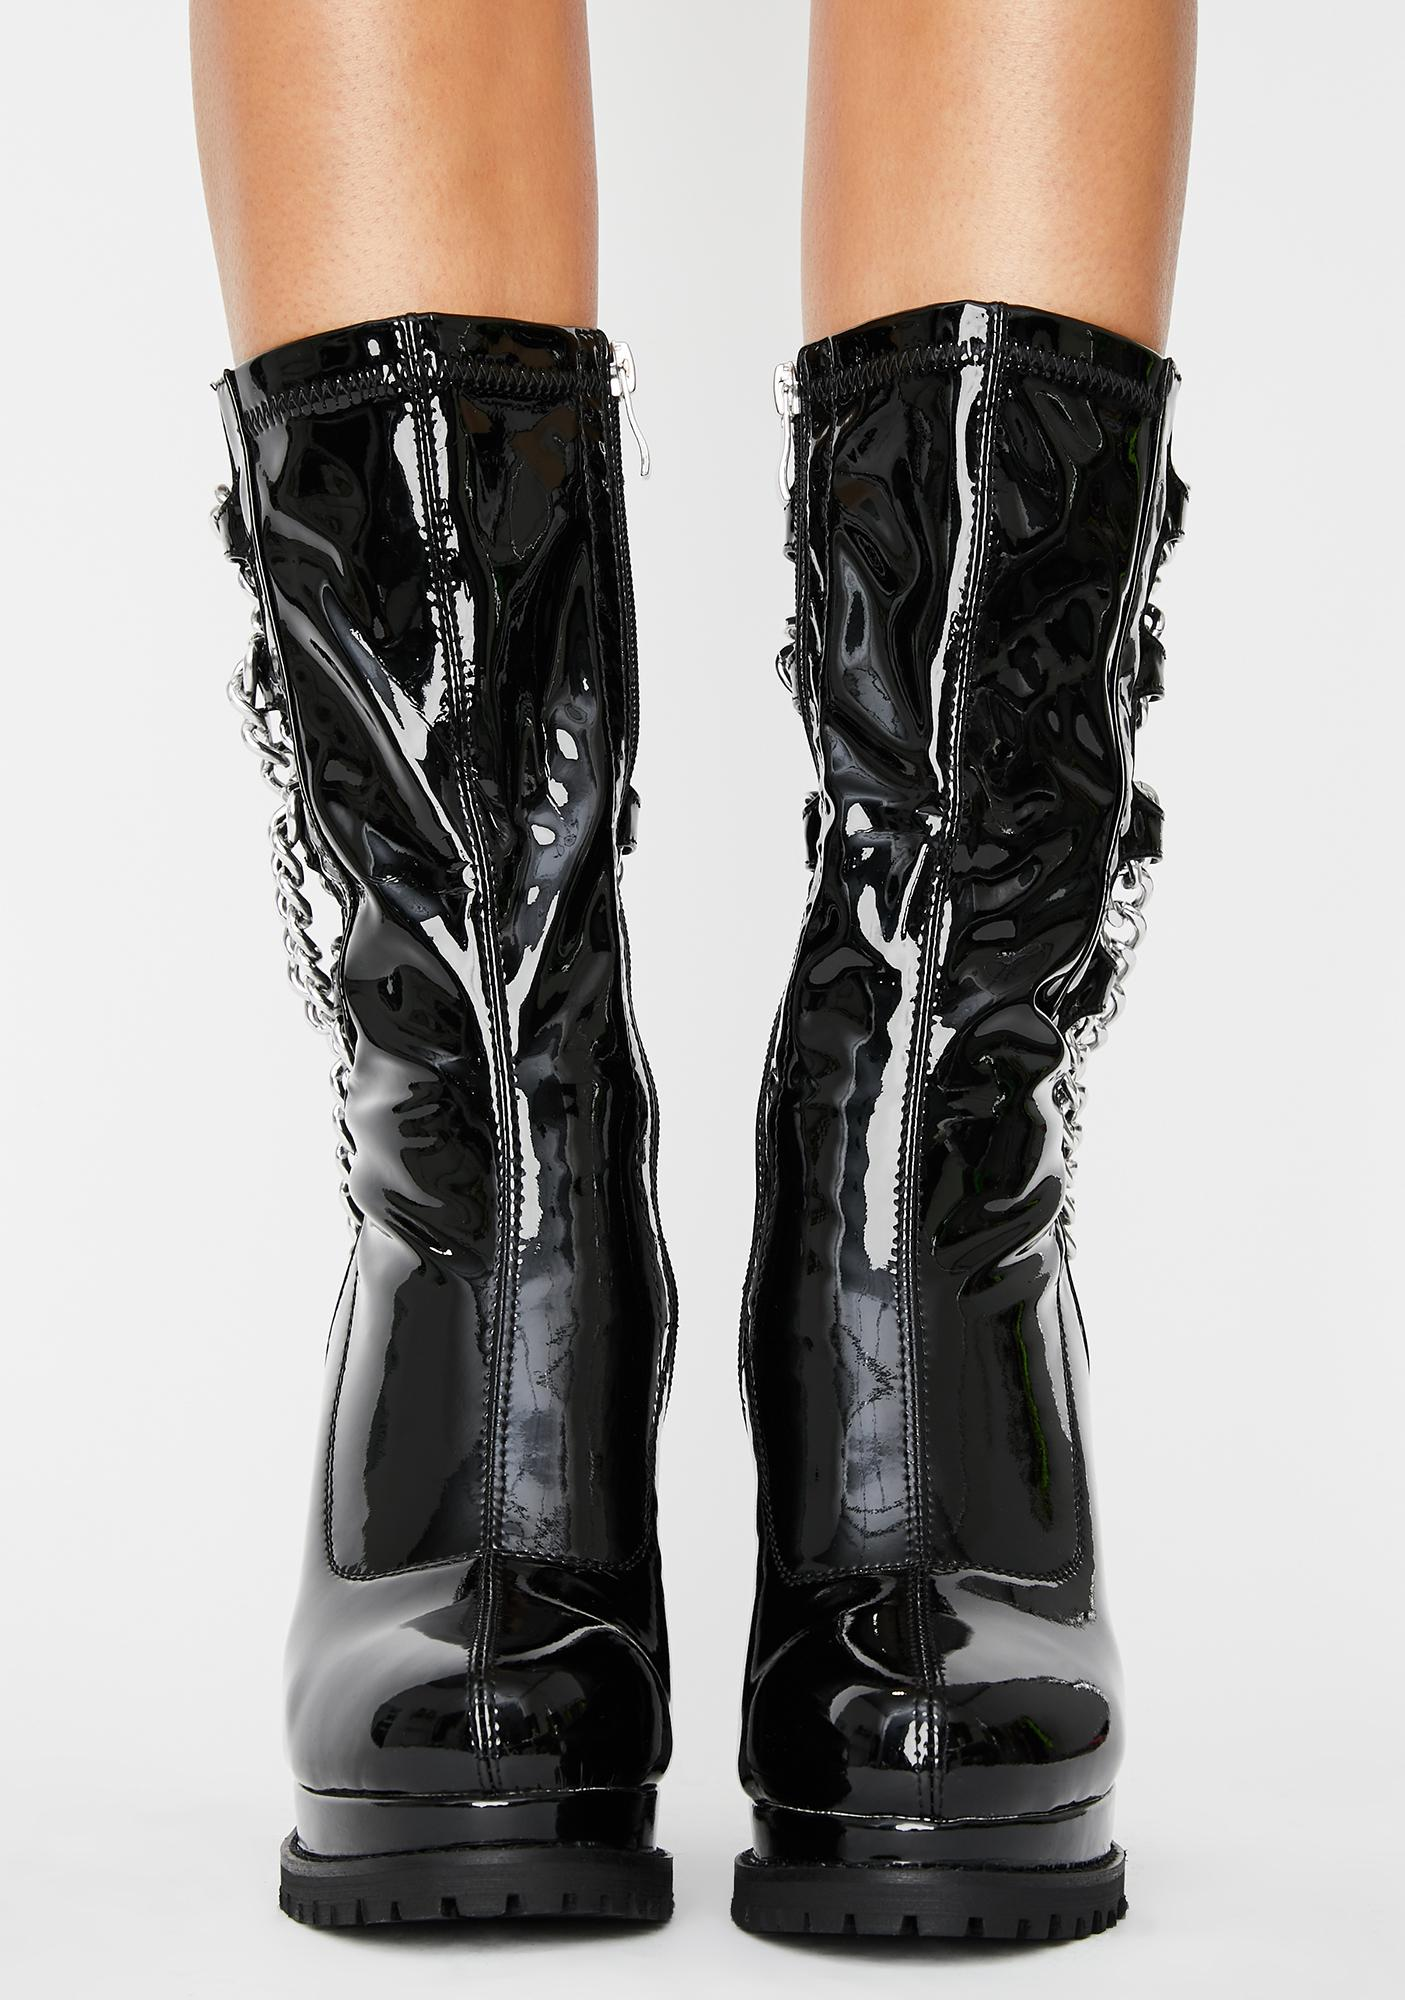 AZALEA WANG Liverpool Chain Boots